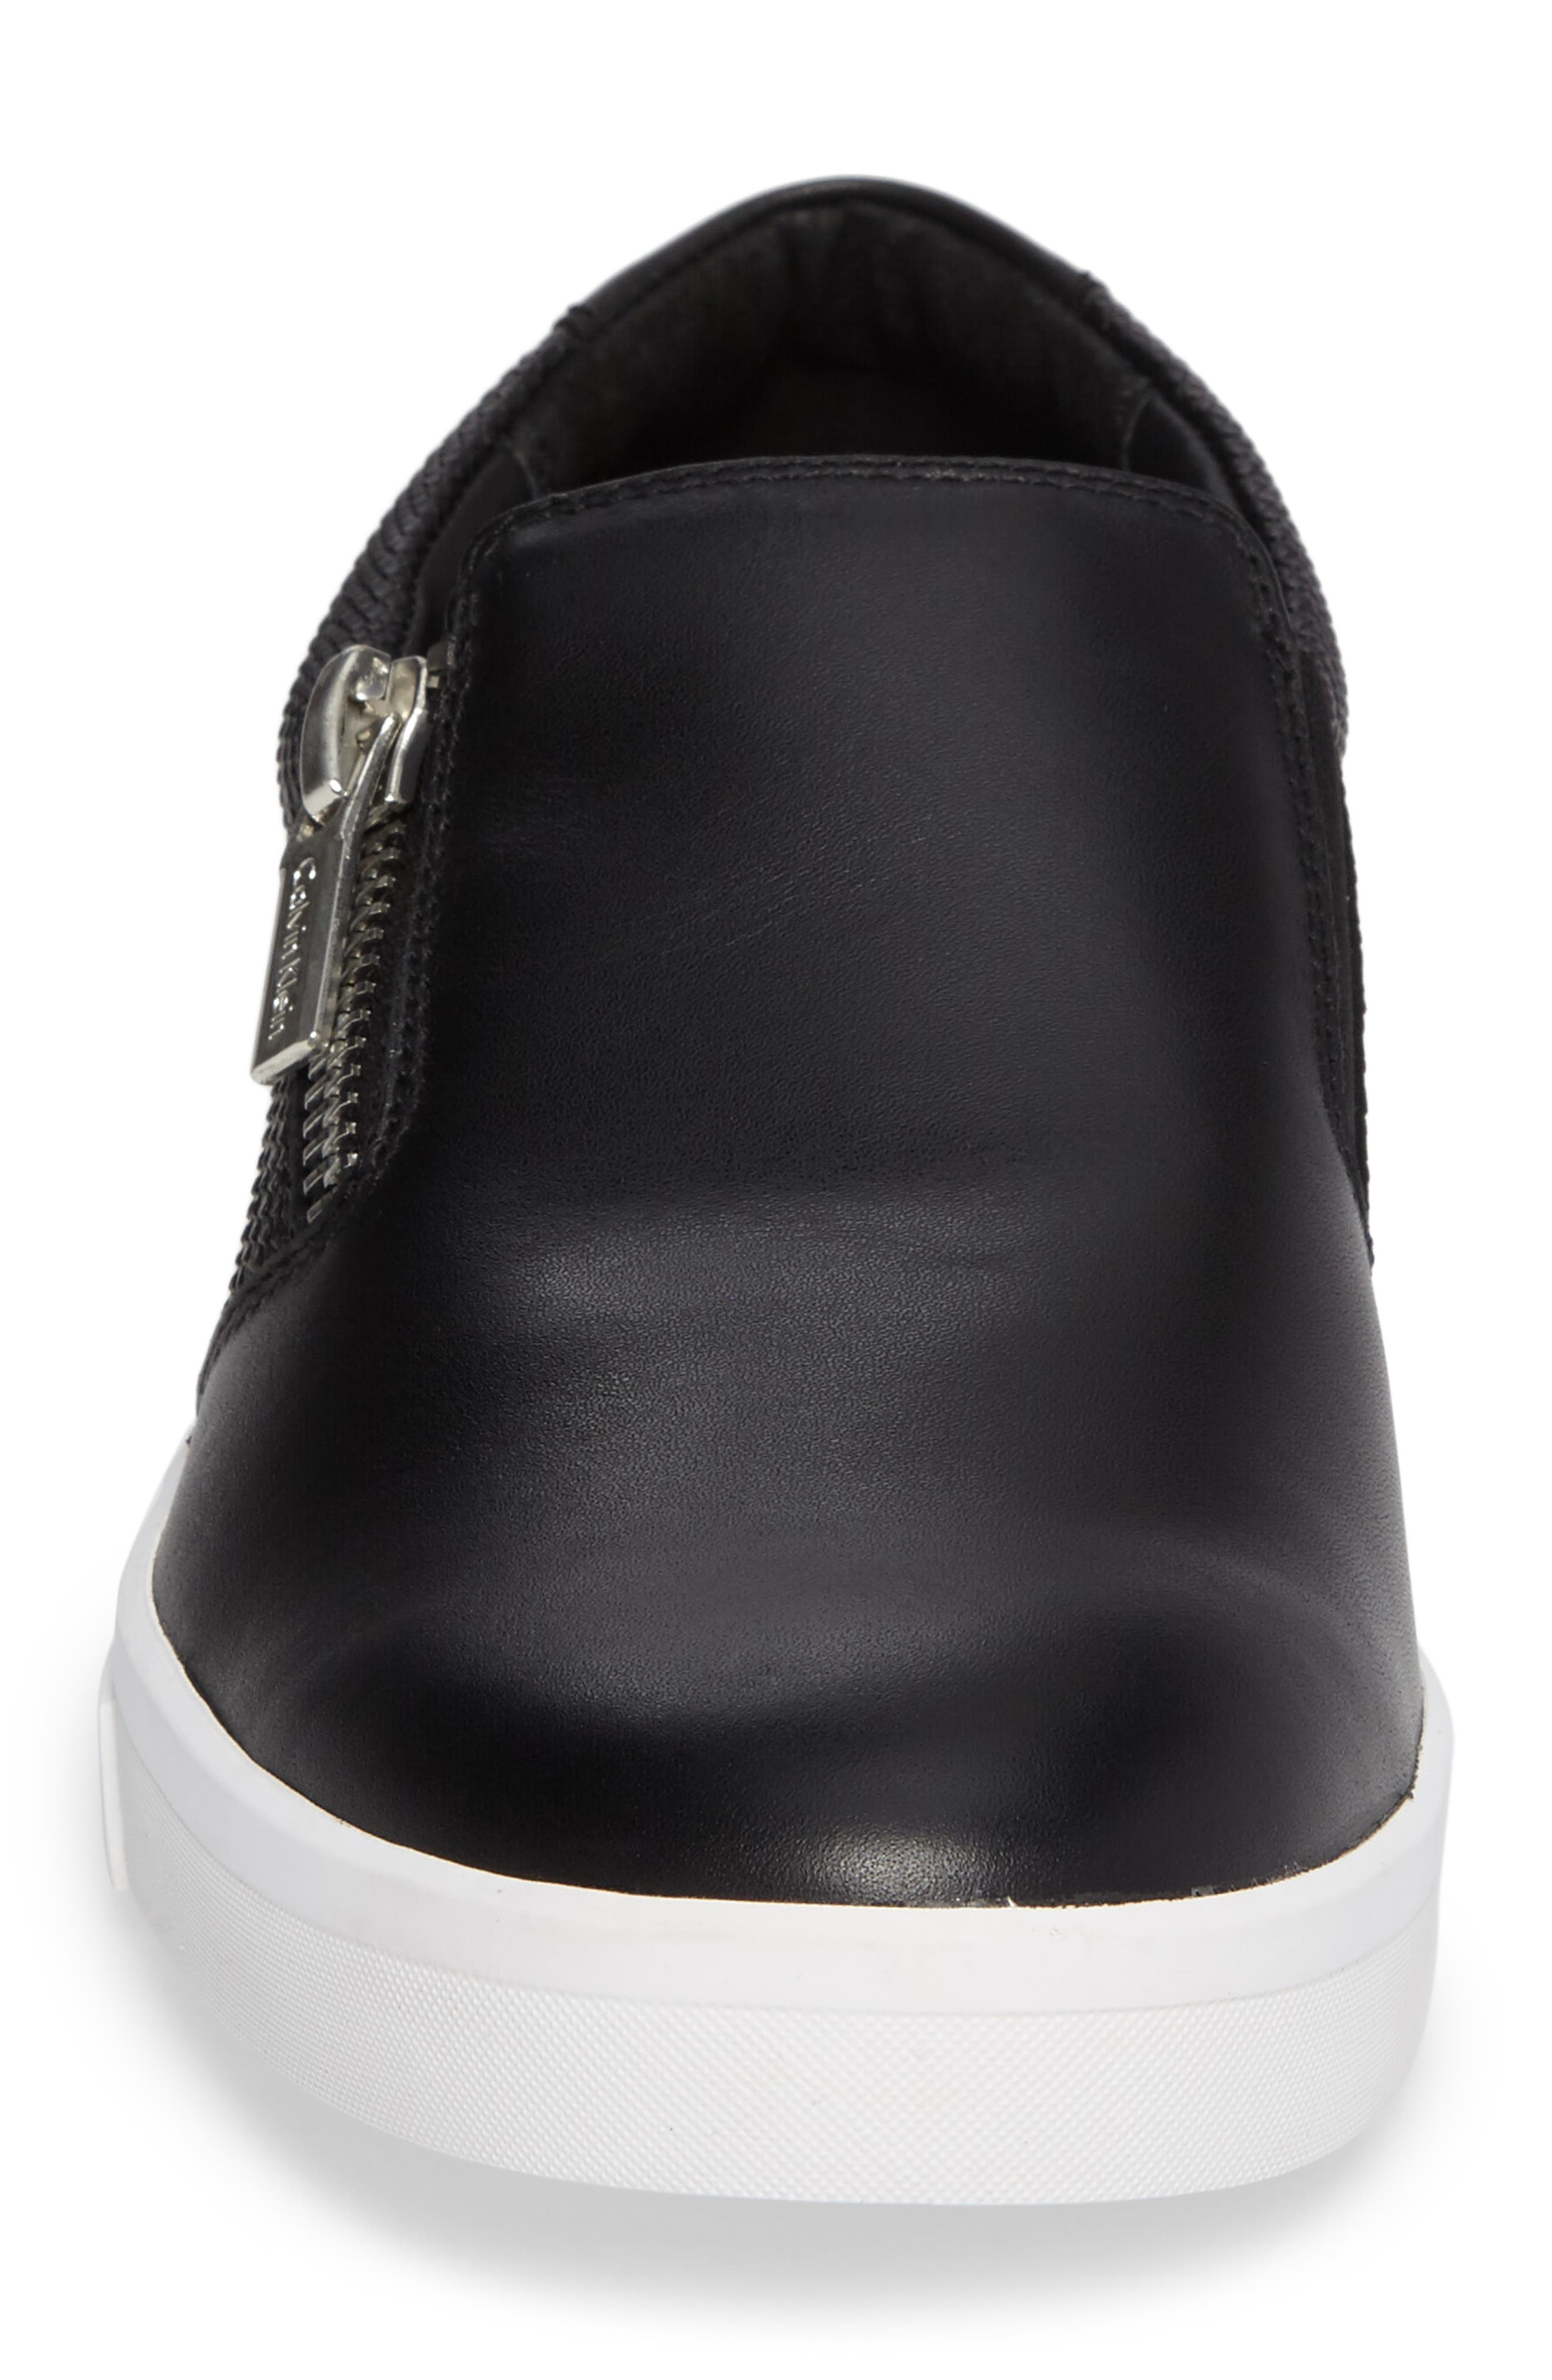 Ibiza Slip-On Zip Sneaker,                             Alternate thumbnail 4, color,                             001